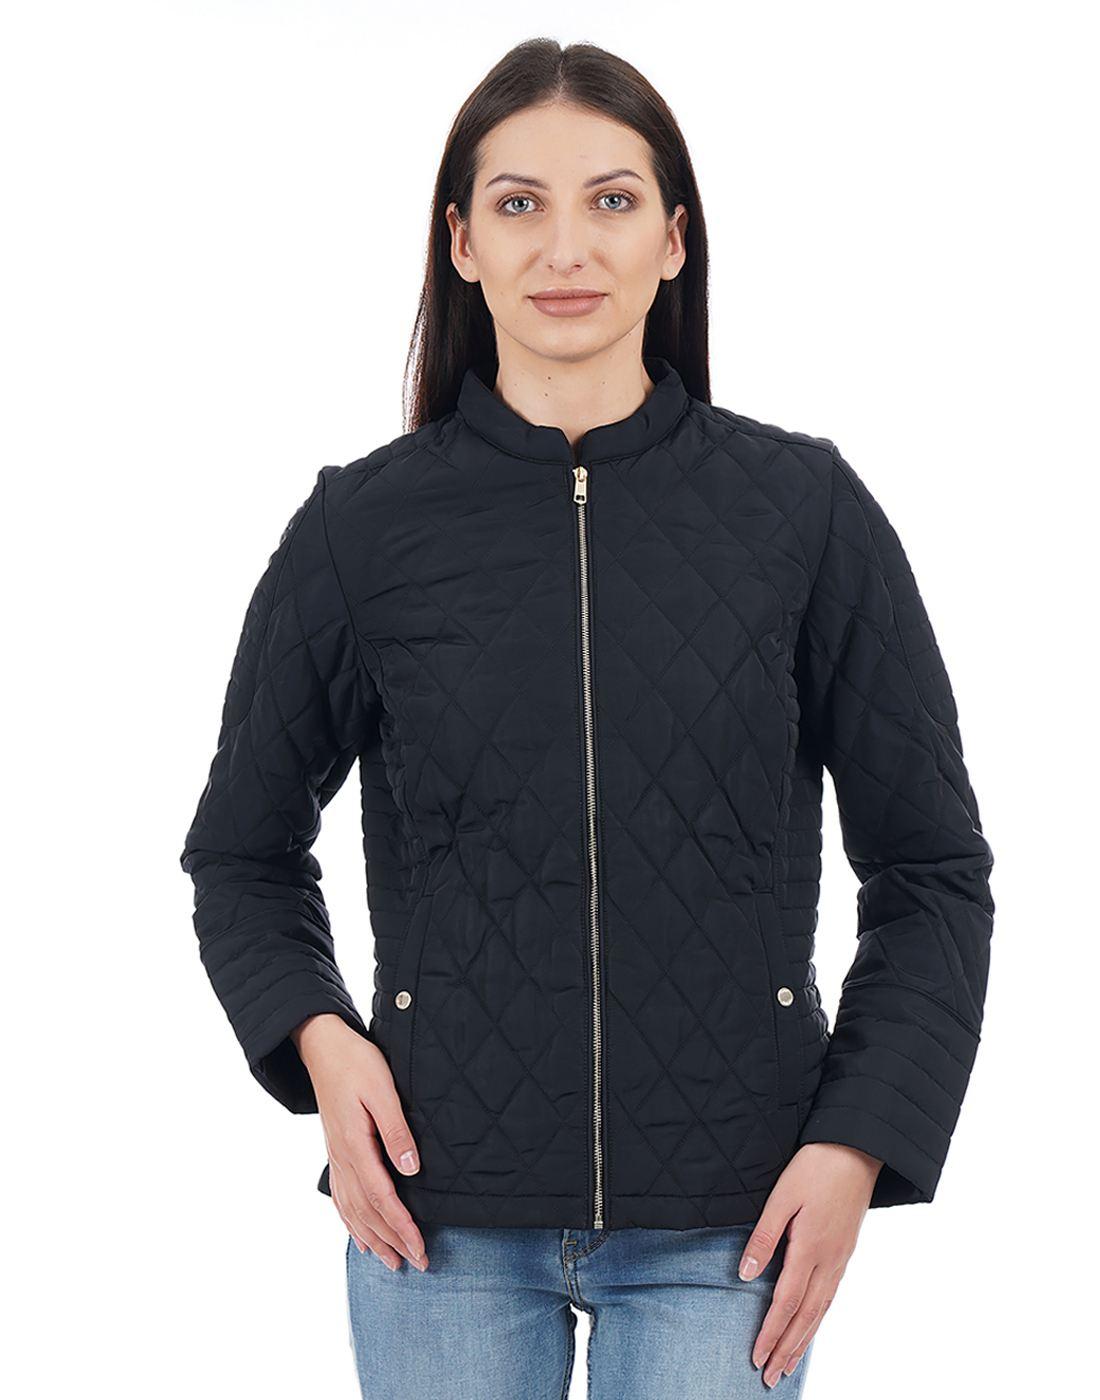 Tommy Hilfiger Women Black Jacket